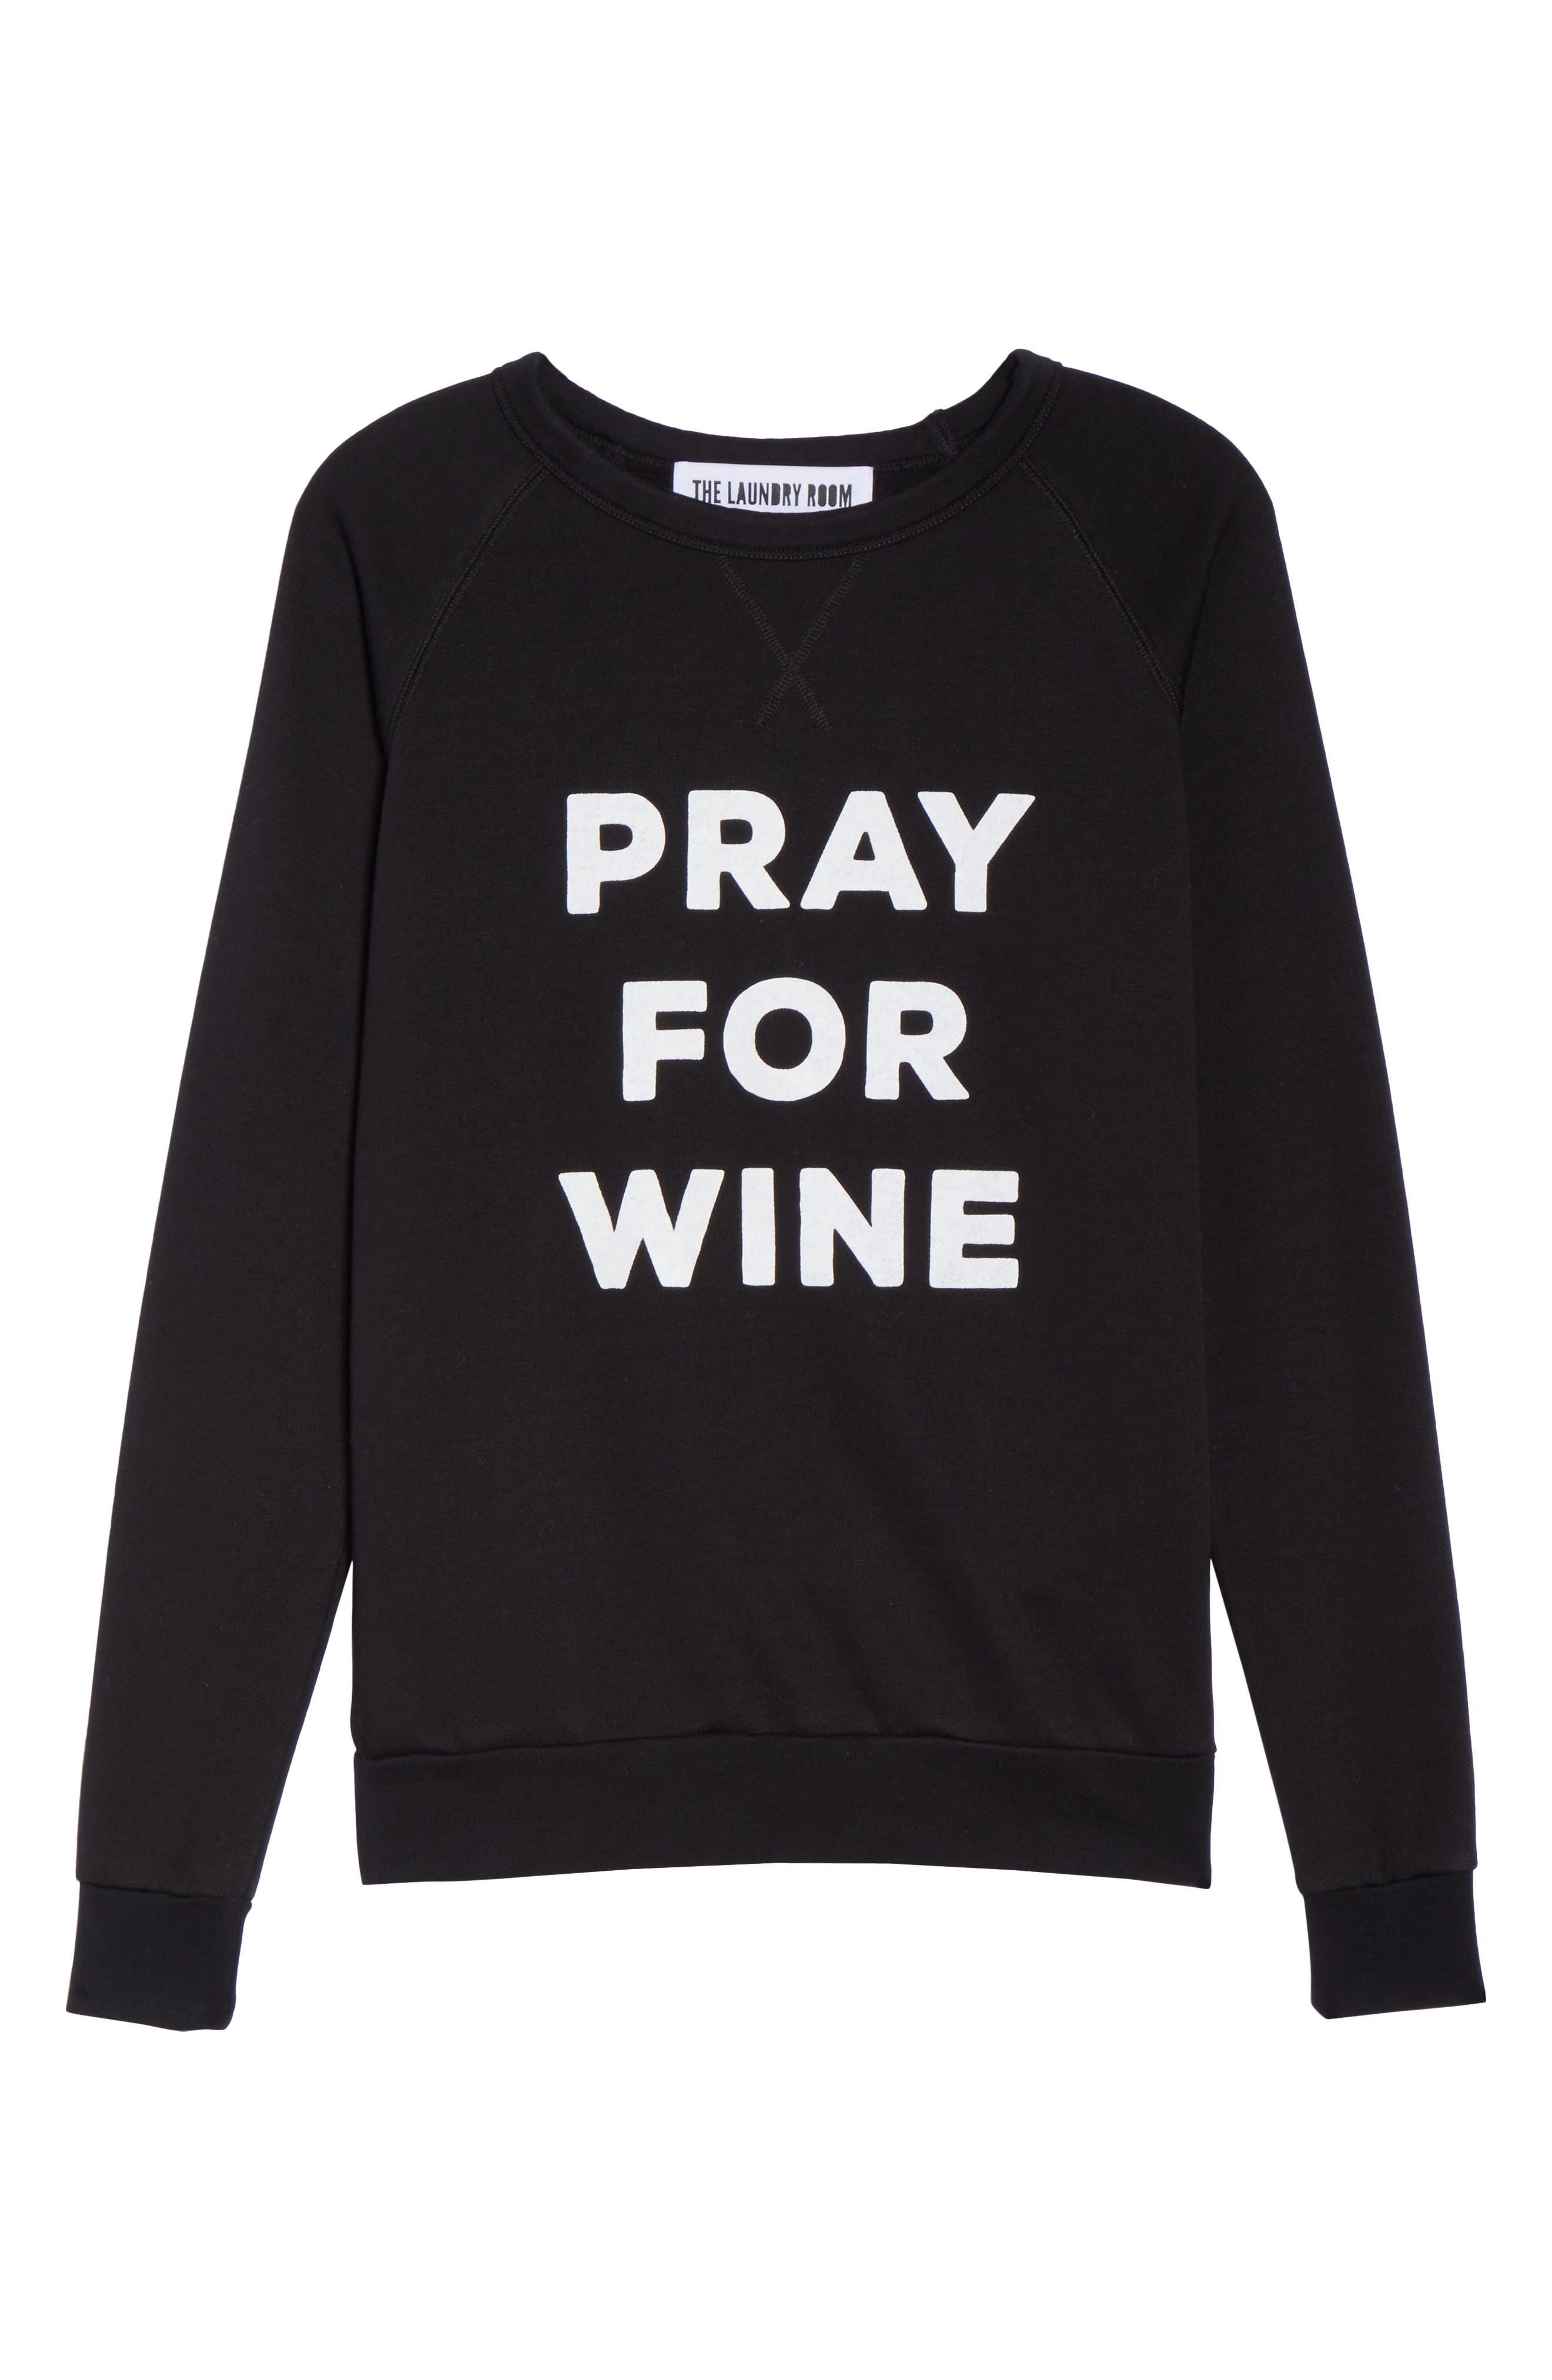 Pray For Wine Sweatshirt,                             Alternate thumbnail 6, color,                             001